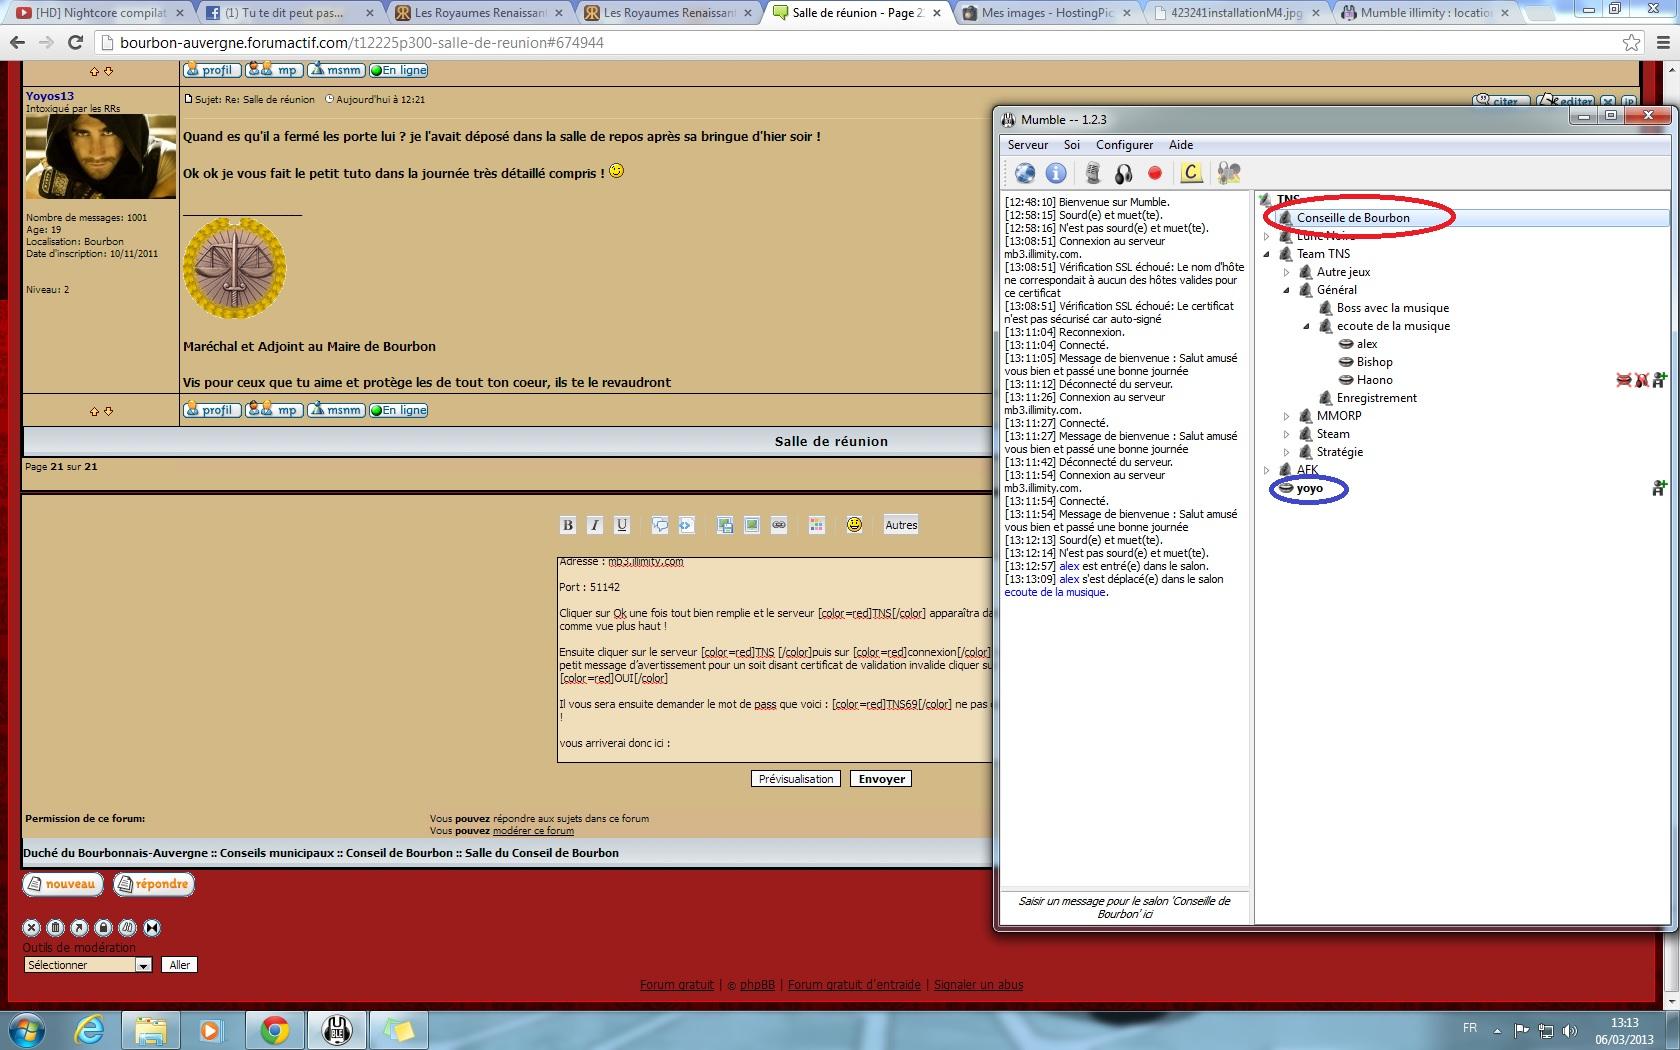 Installer et configurer mumble 413309installationM6